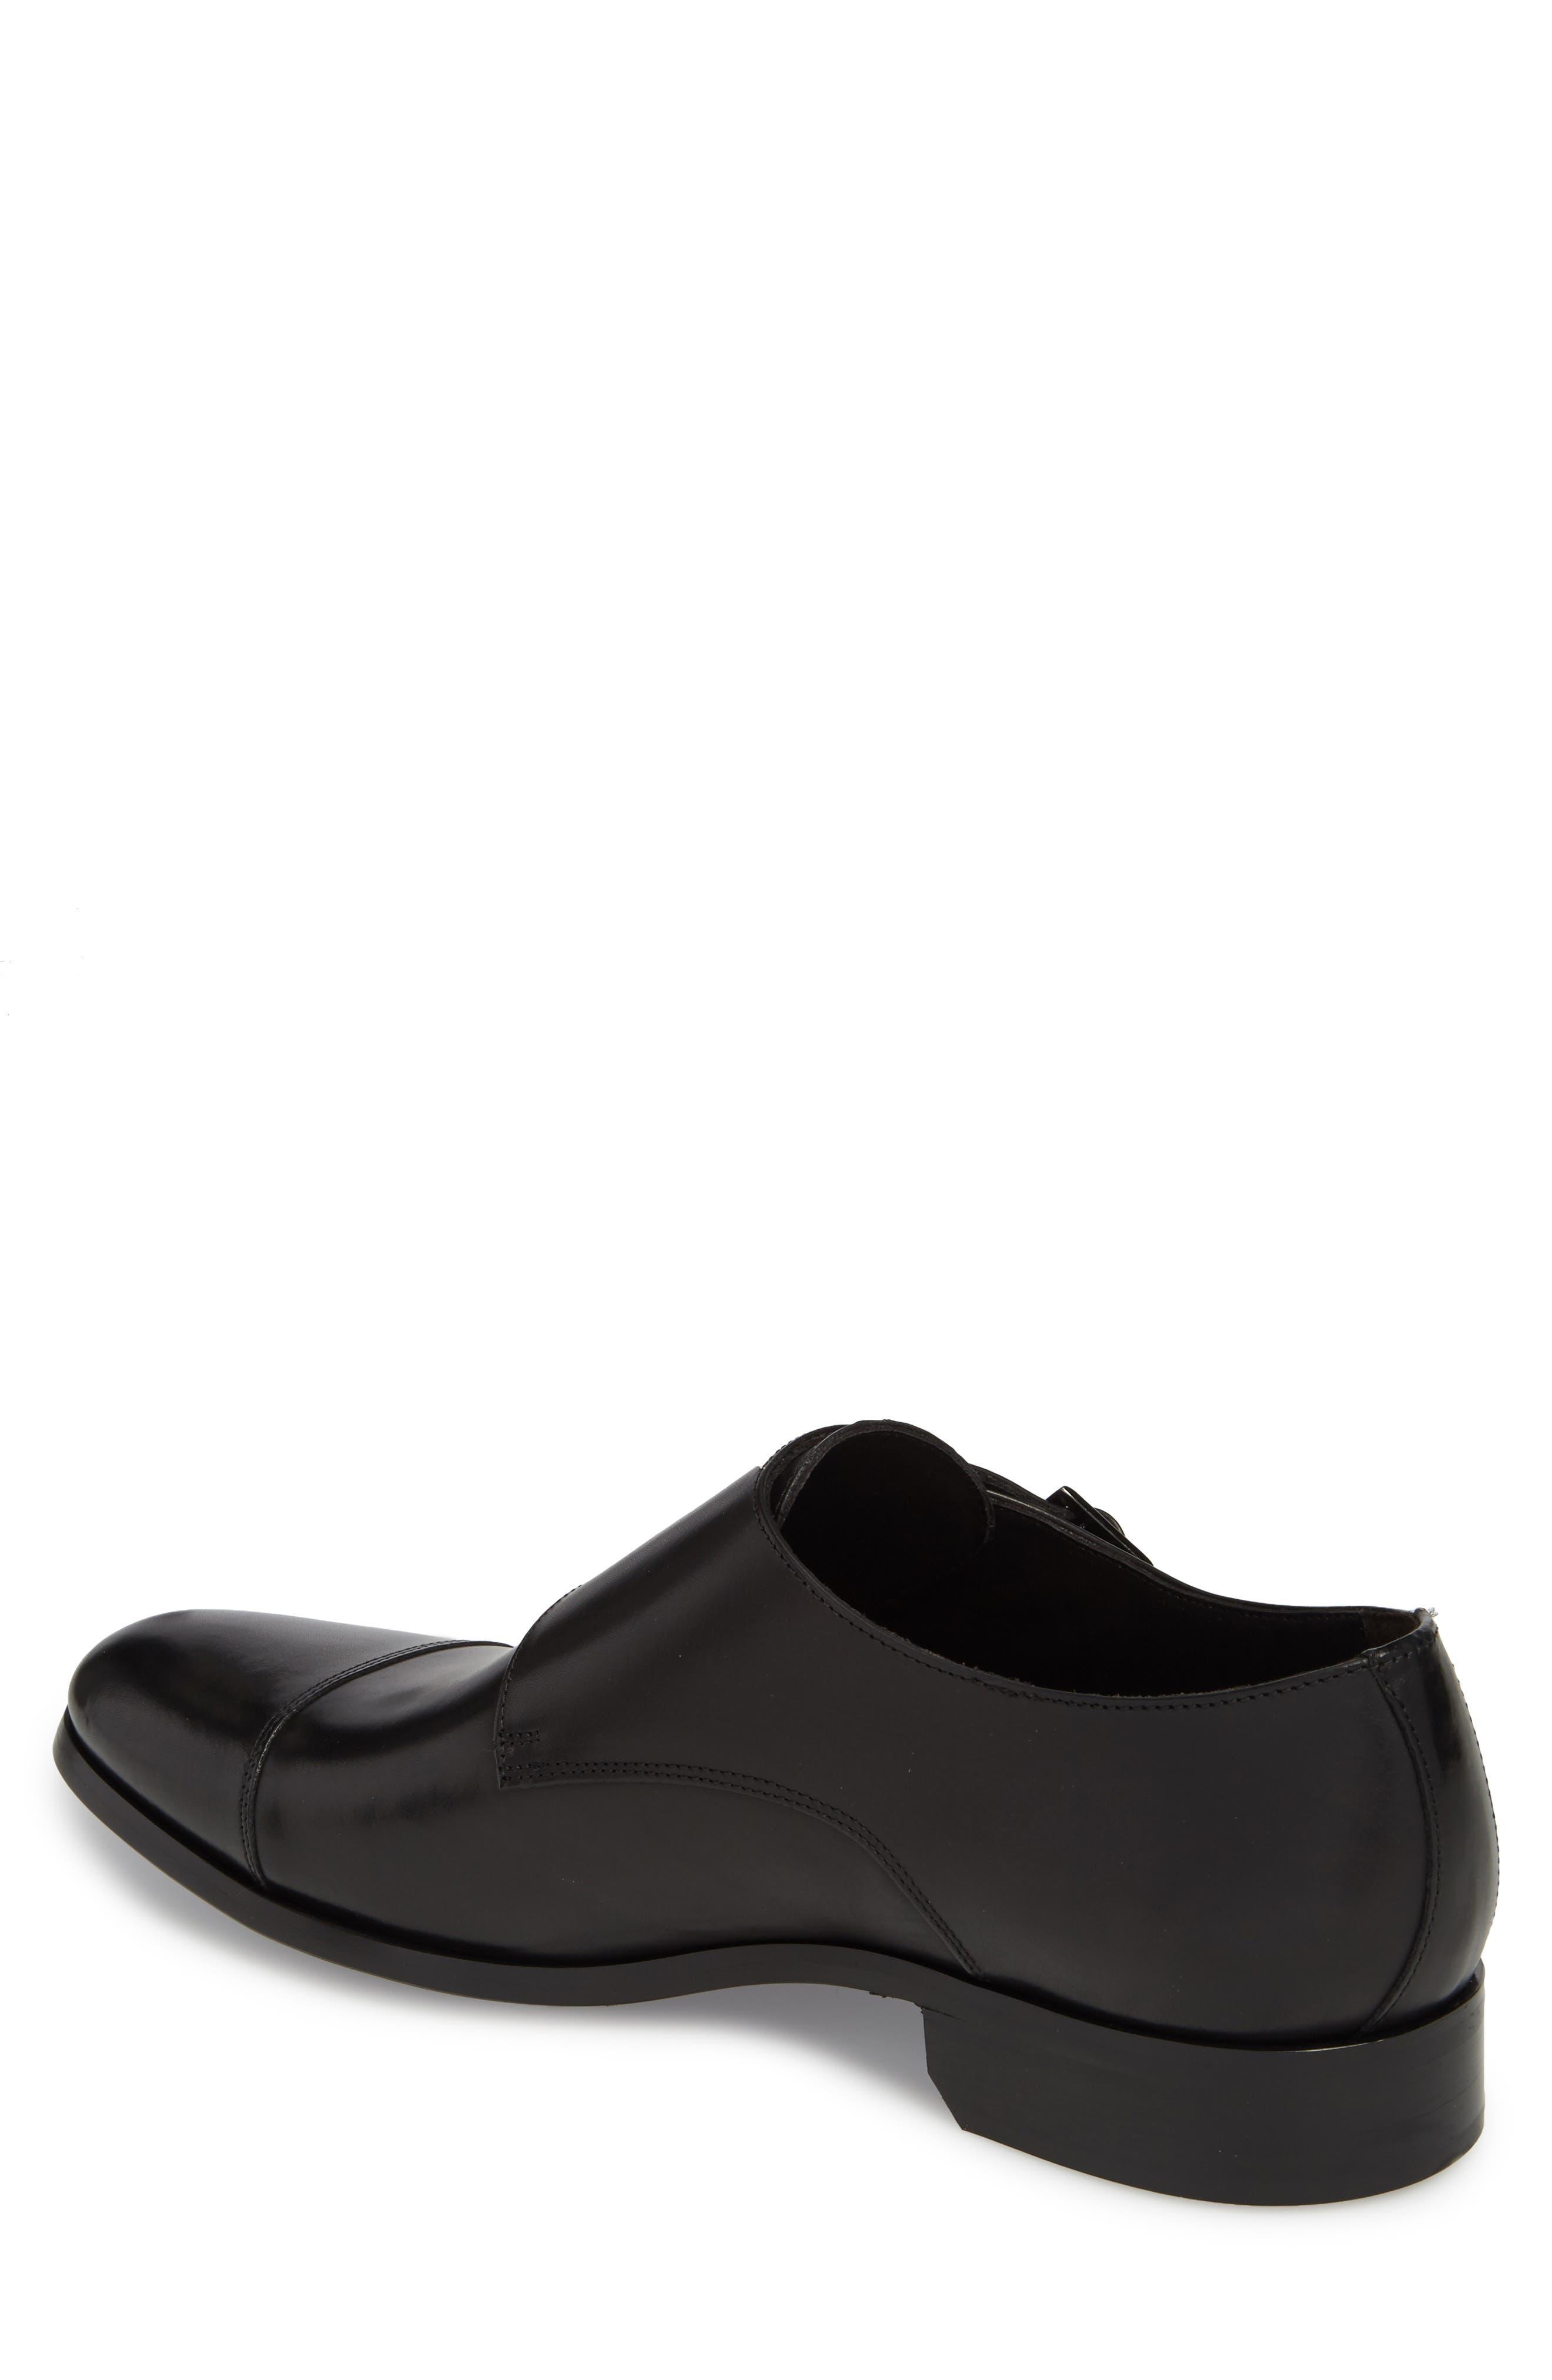 Bankston Cap Toe Double Strap Monk Shoe,                             Alternate thumbnail 2, color,                             BLACK LEATHER